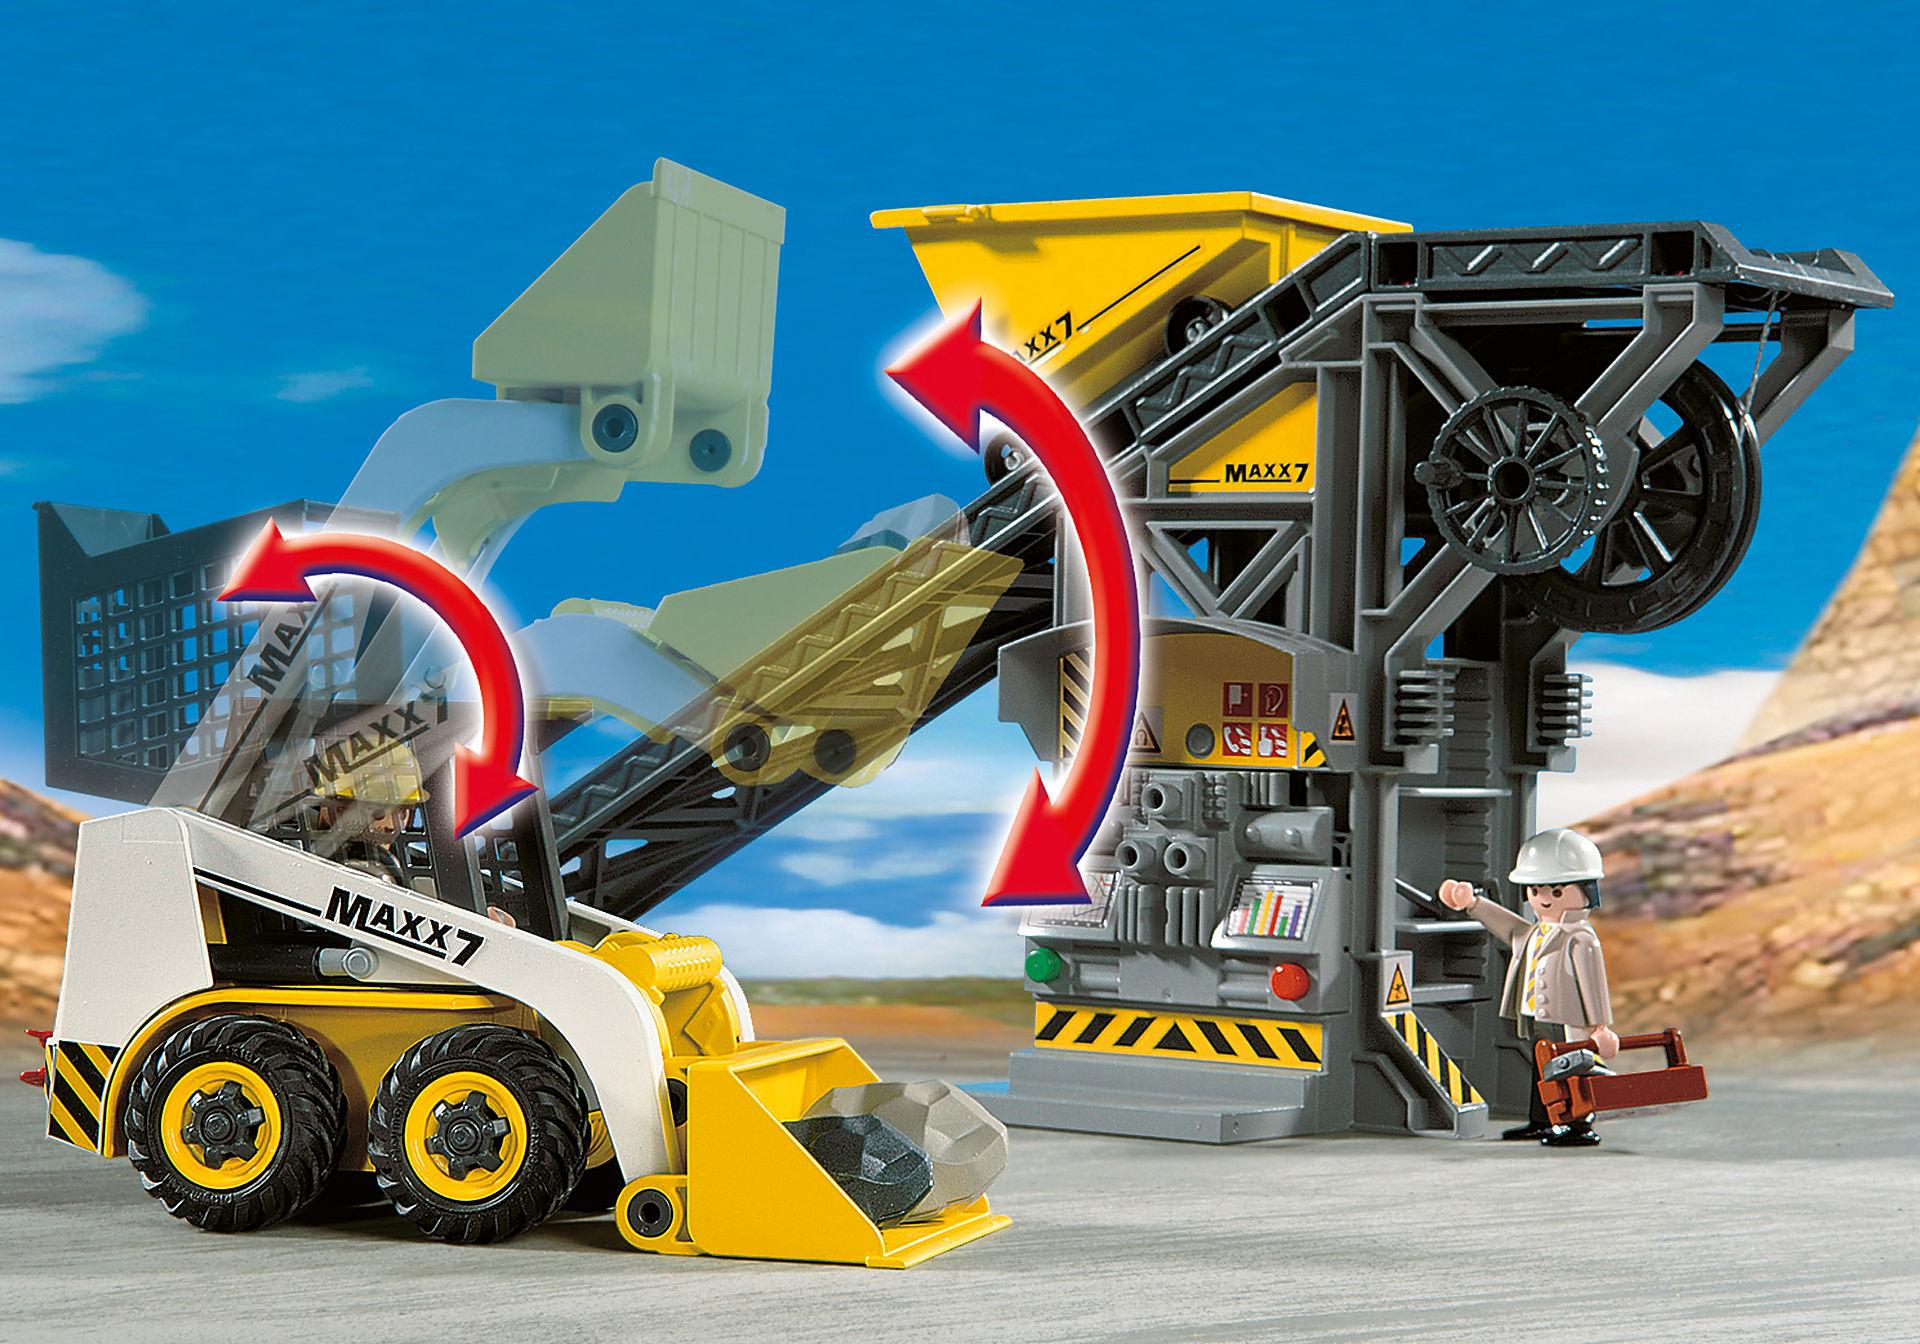 4041 Conveyor Belt with Mini Excavator zoom image7